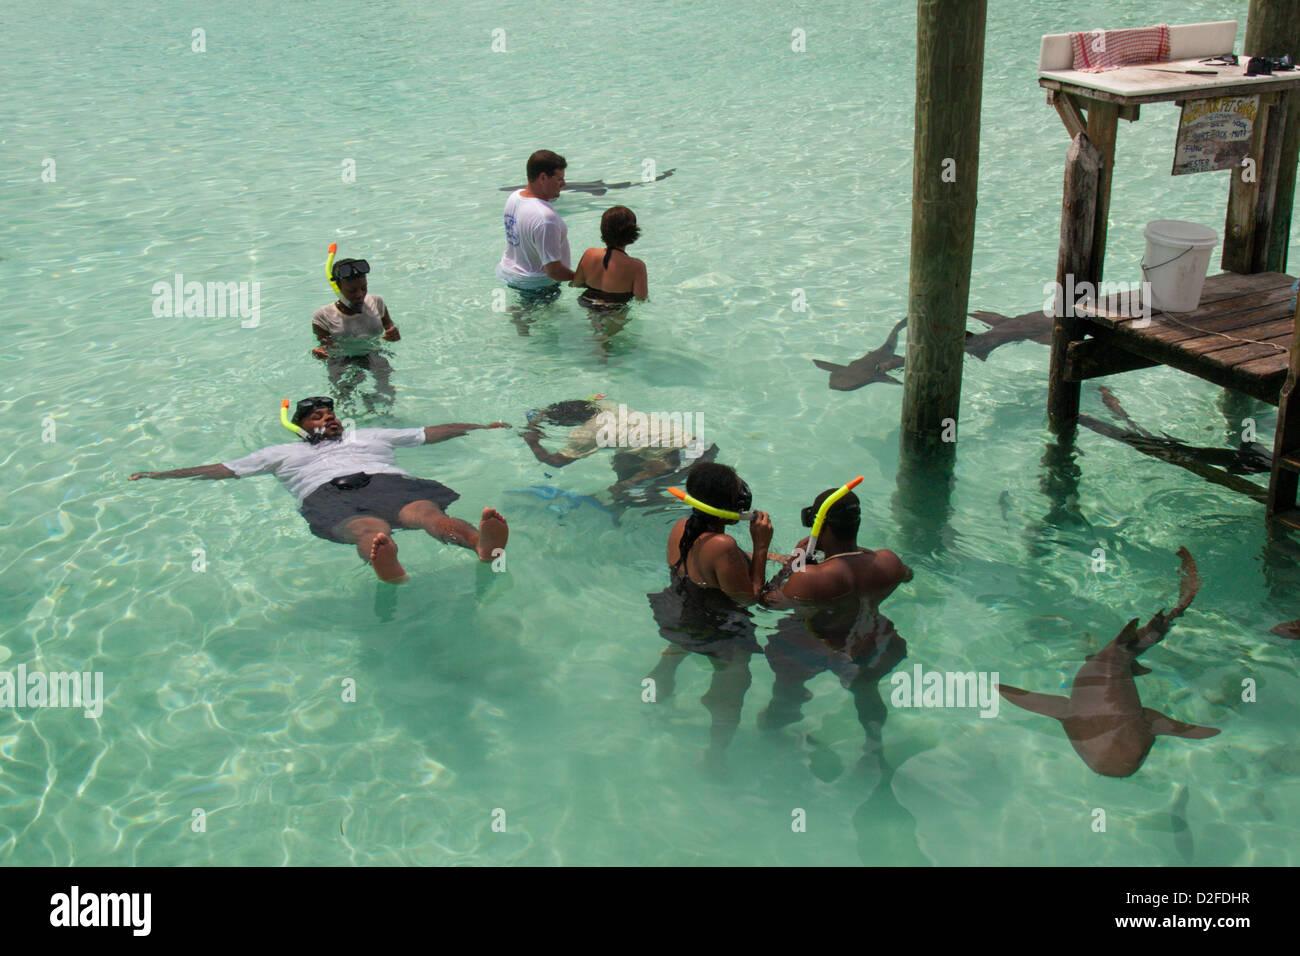 Nurse Sharks Stock Photos & Nurse Sharks Stock Images - Alamy on